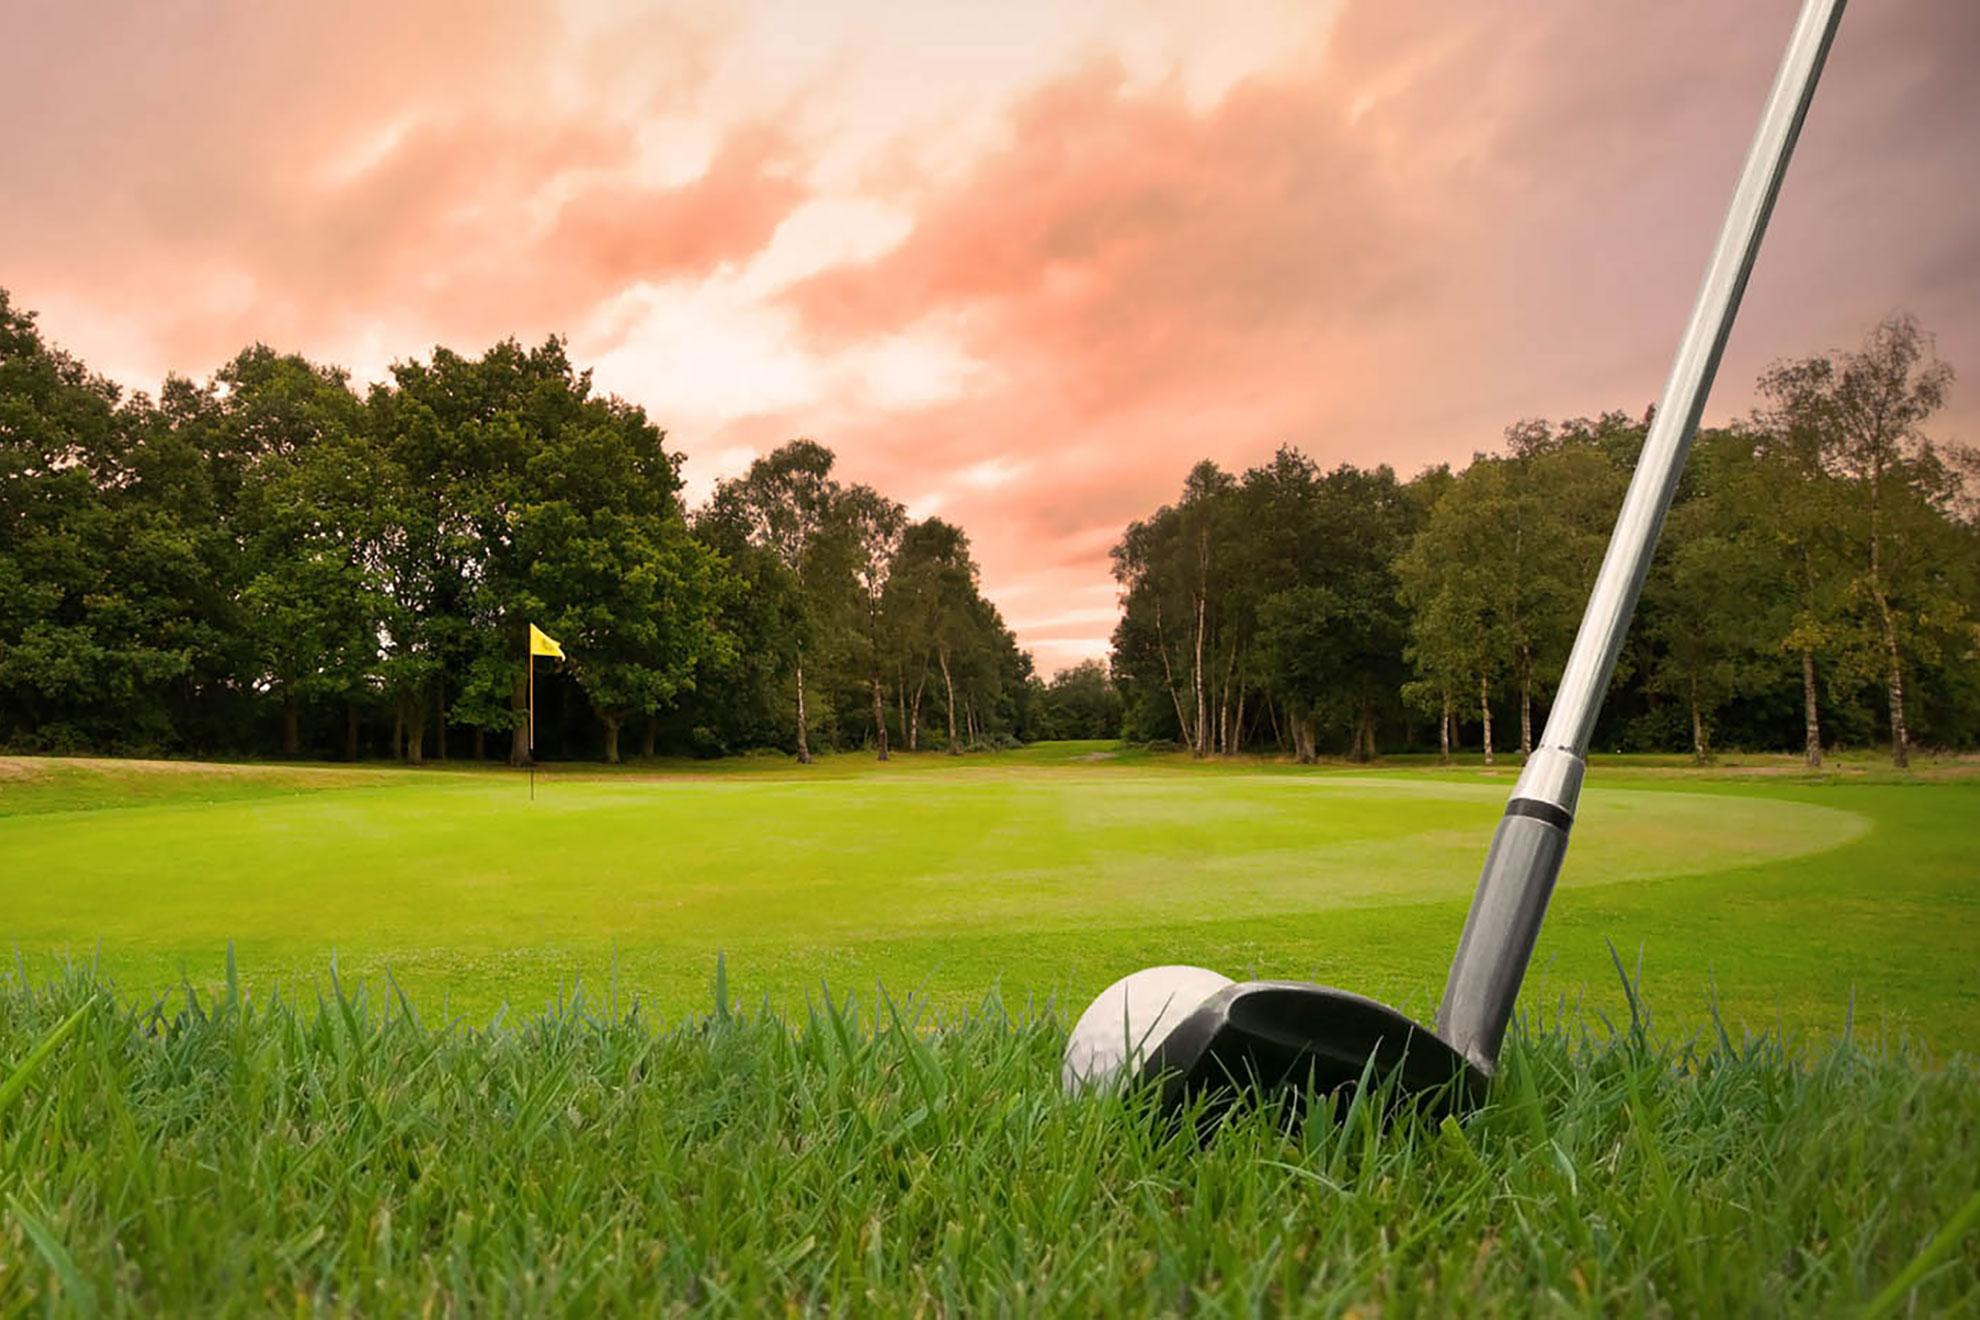 NIG-golf-club-member-insurance